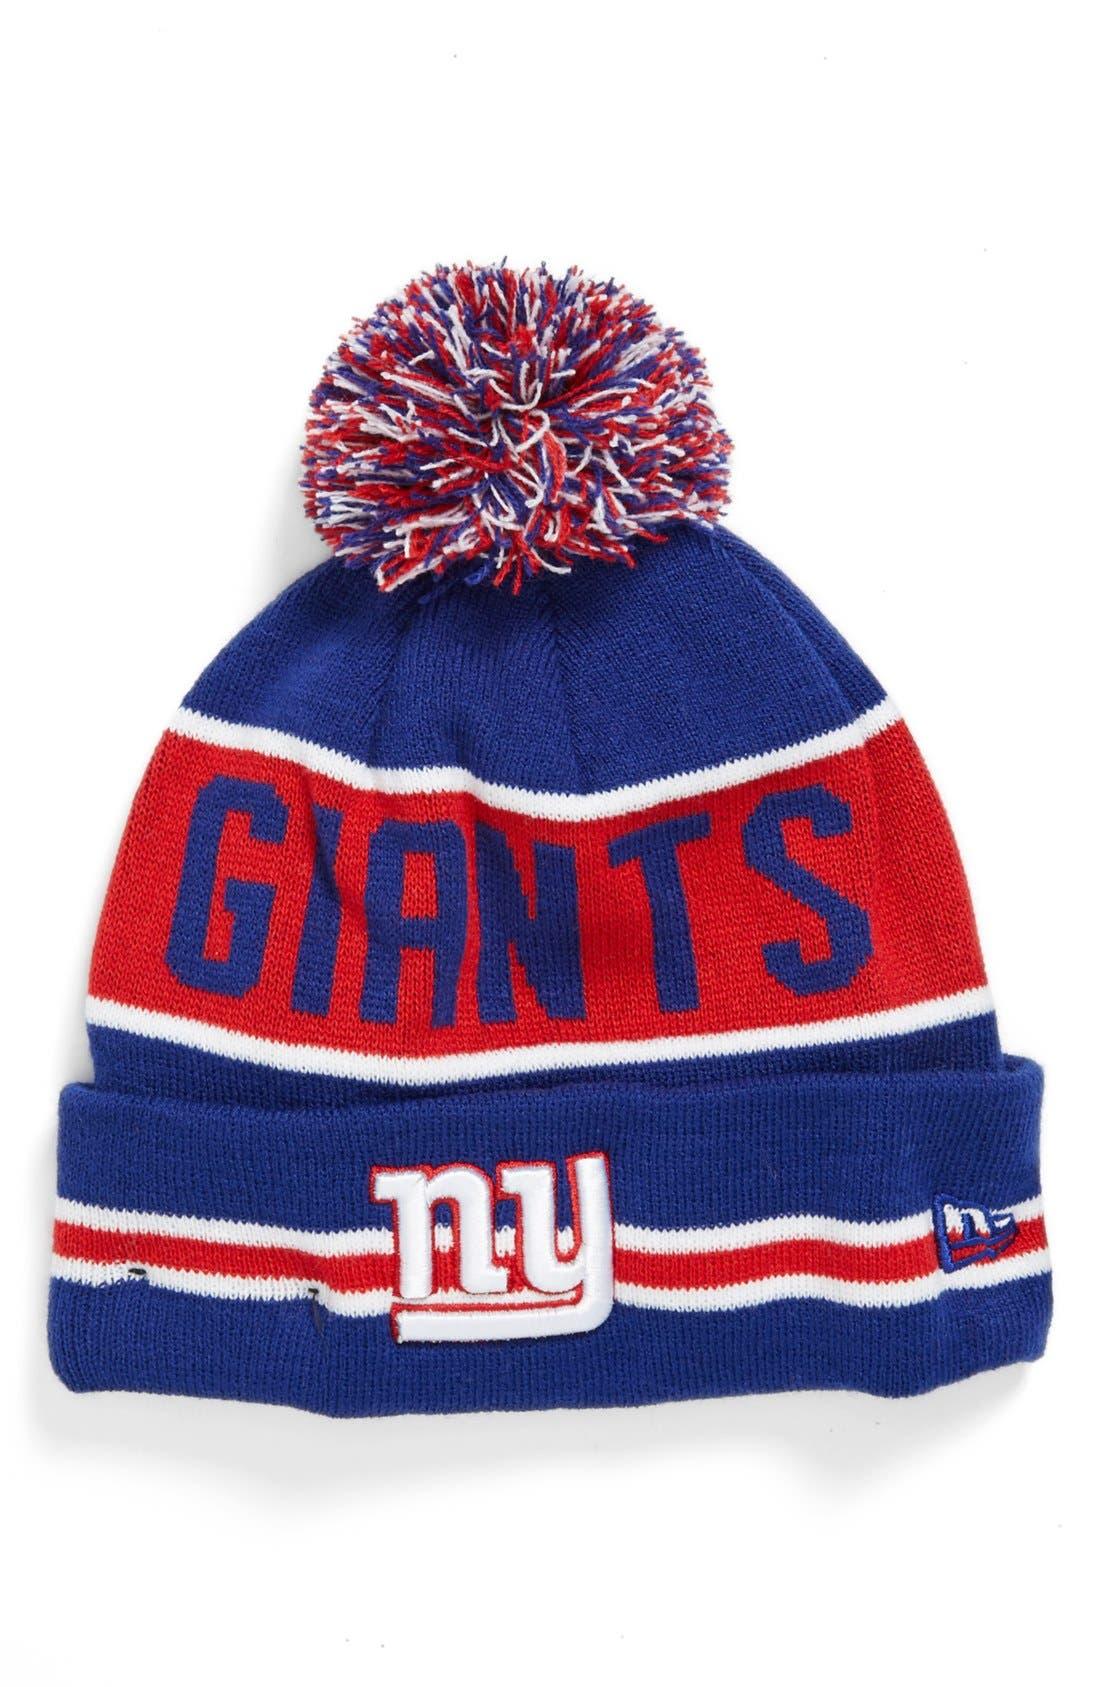 Main Image - New Era Cap 'The Coach - New York Giants' Knit Cap